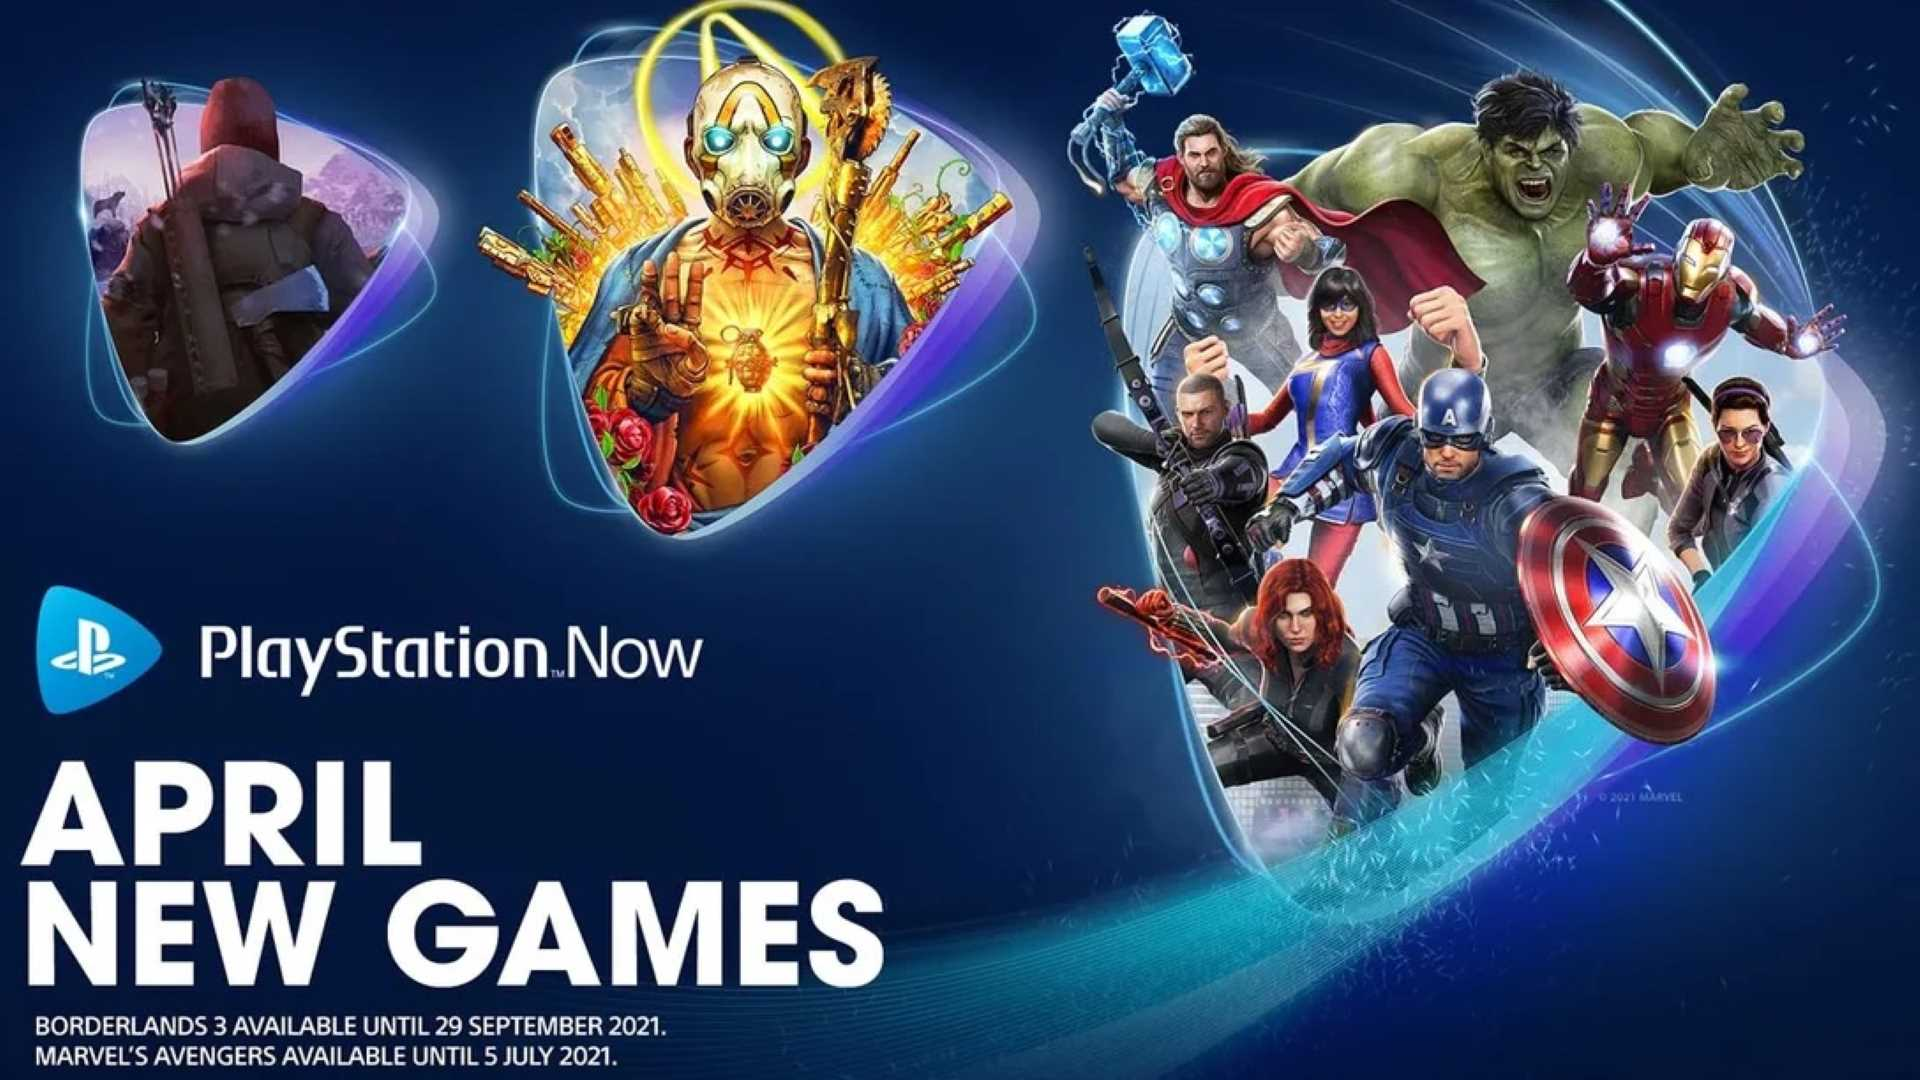 PlayStation Now April 2021 - Keyart